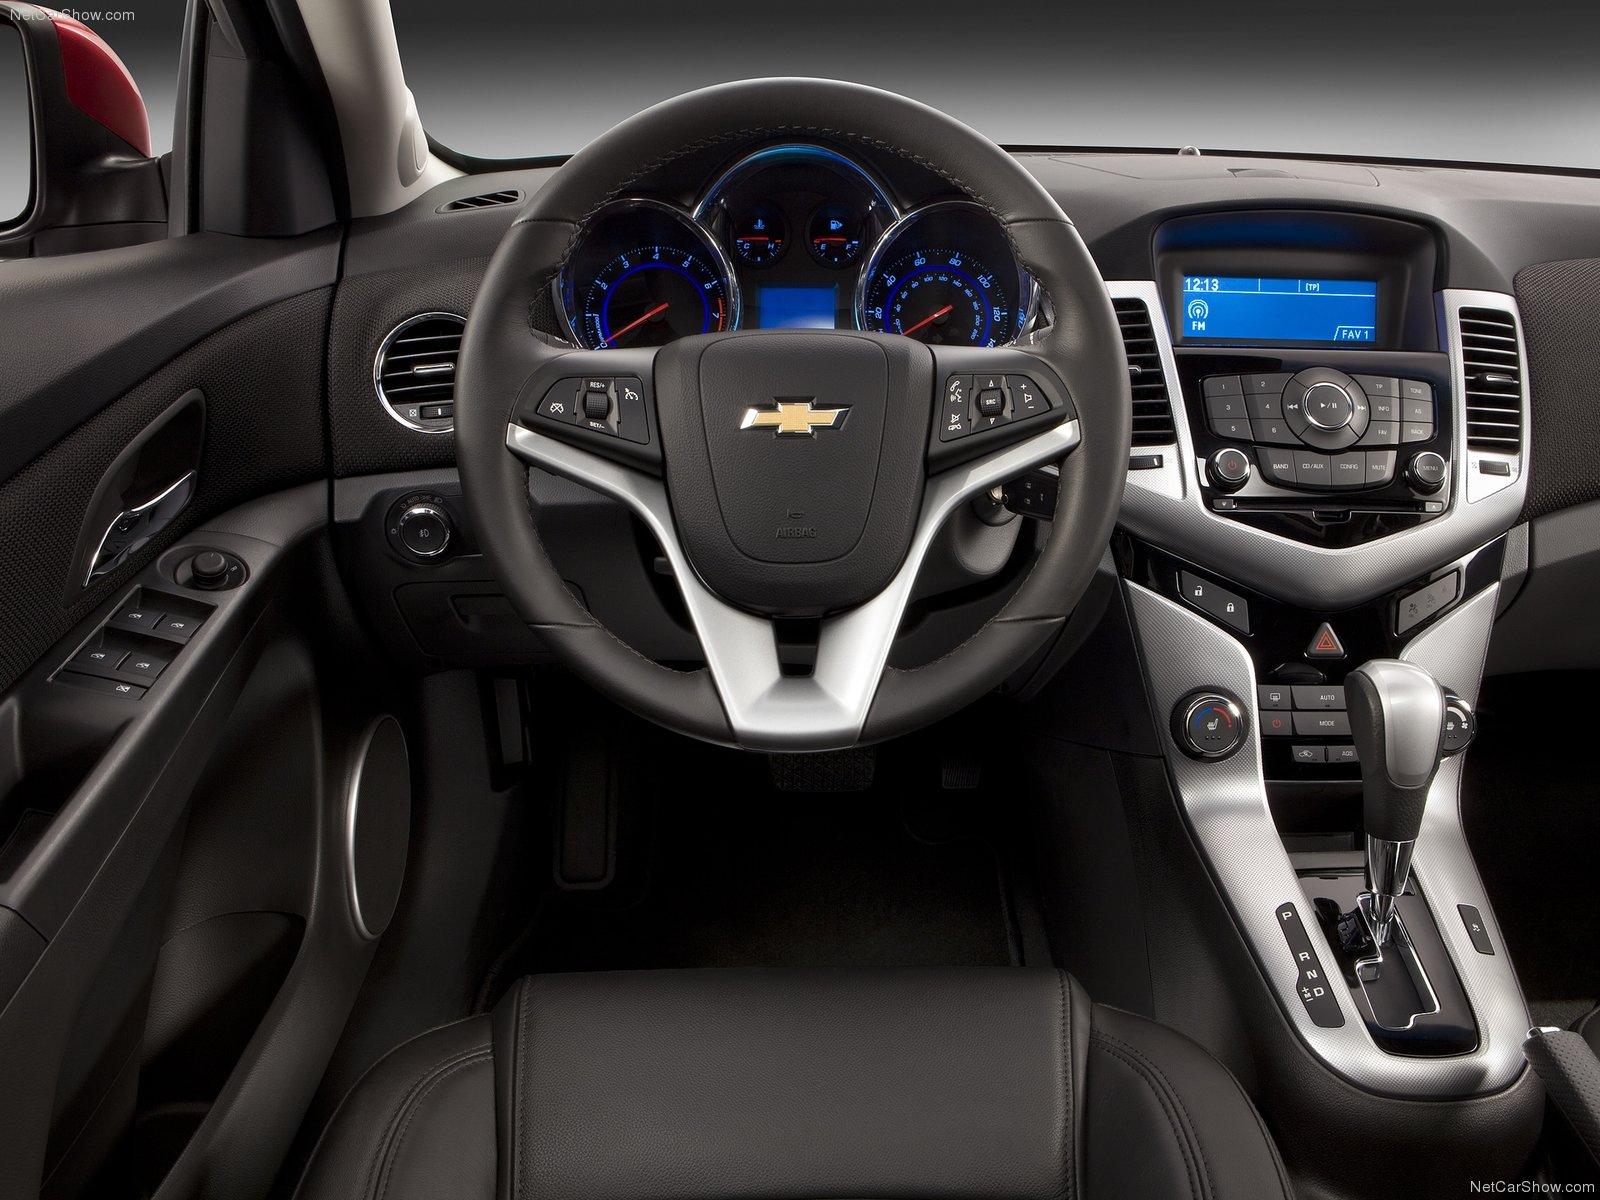 Chevrolet cruze sedan 2011 chevrolet cruze sedan 2011